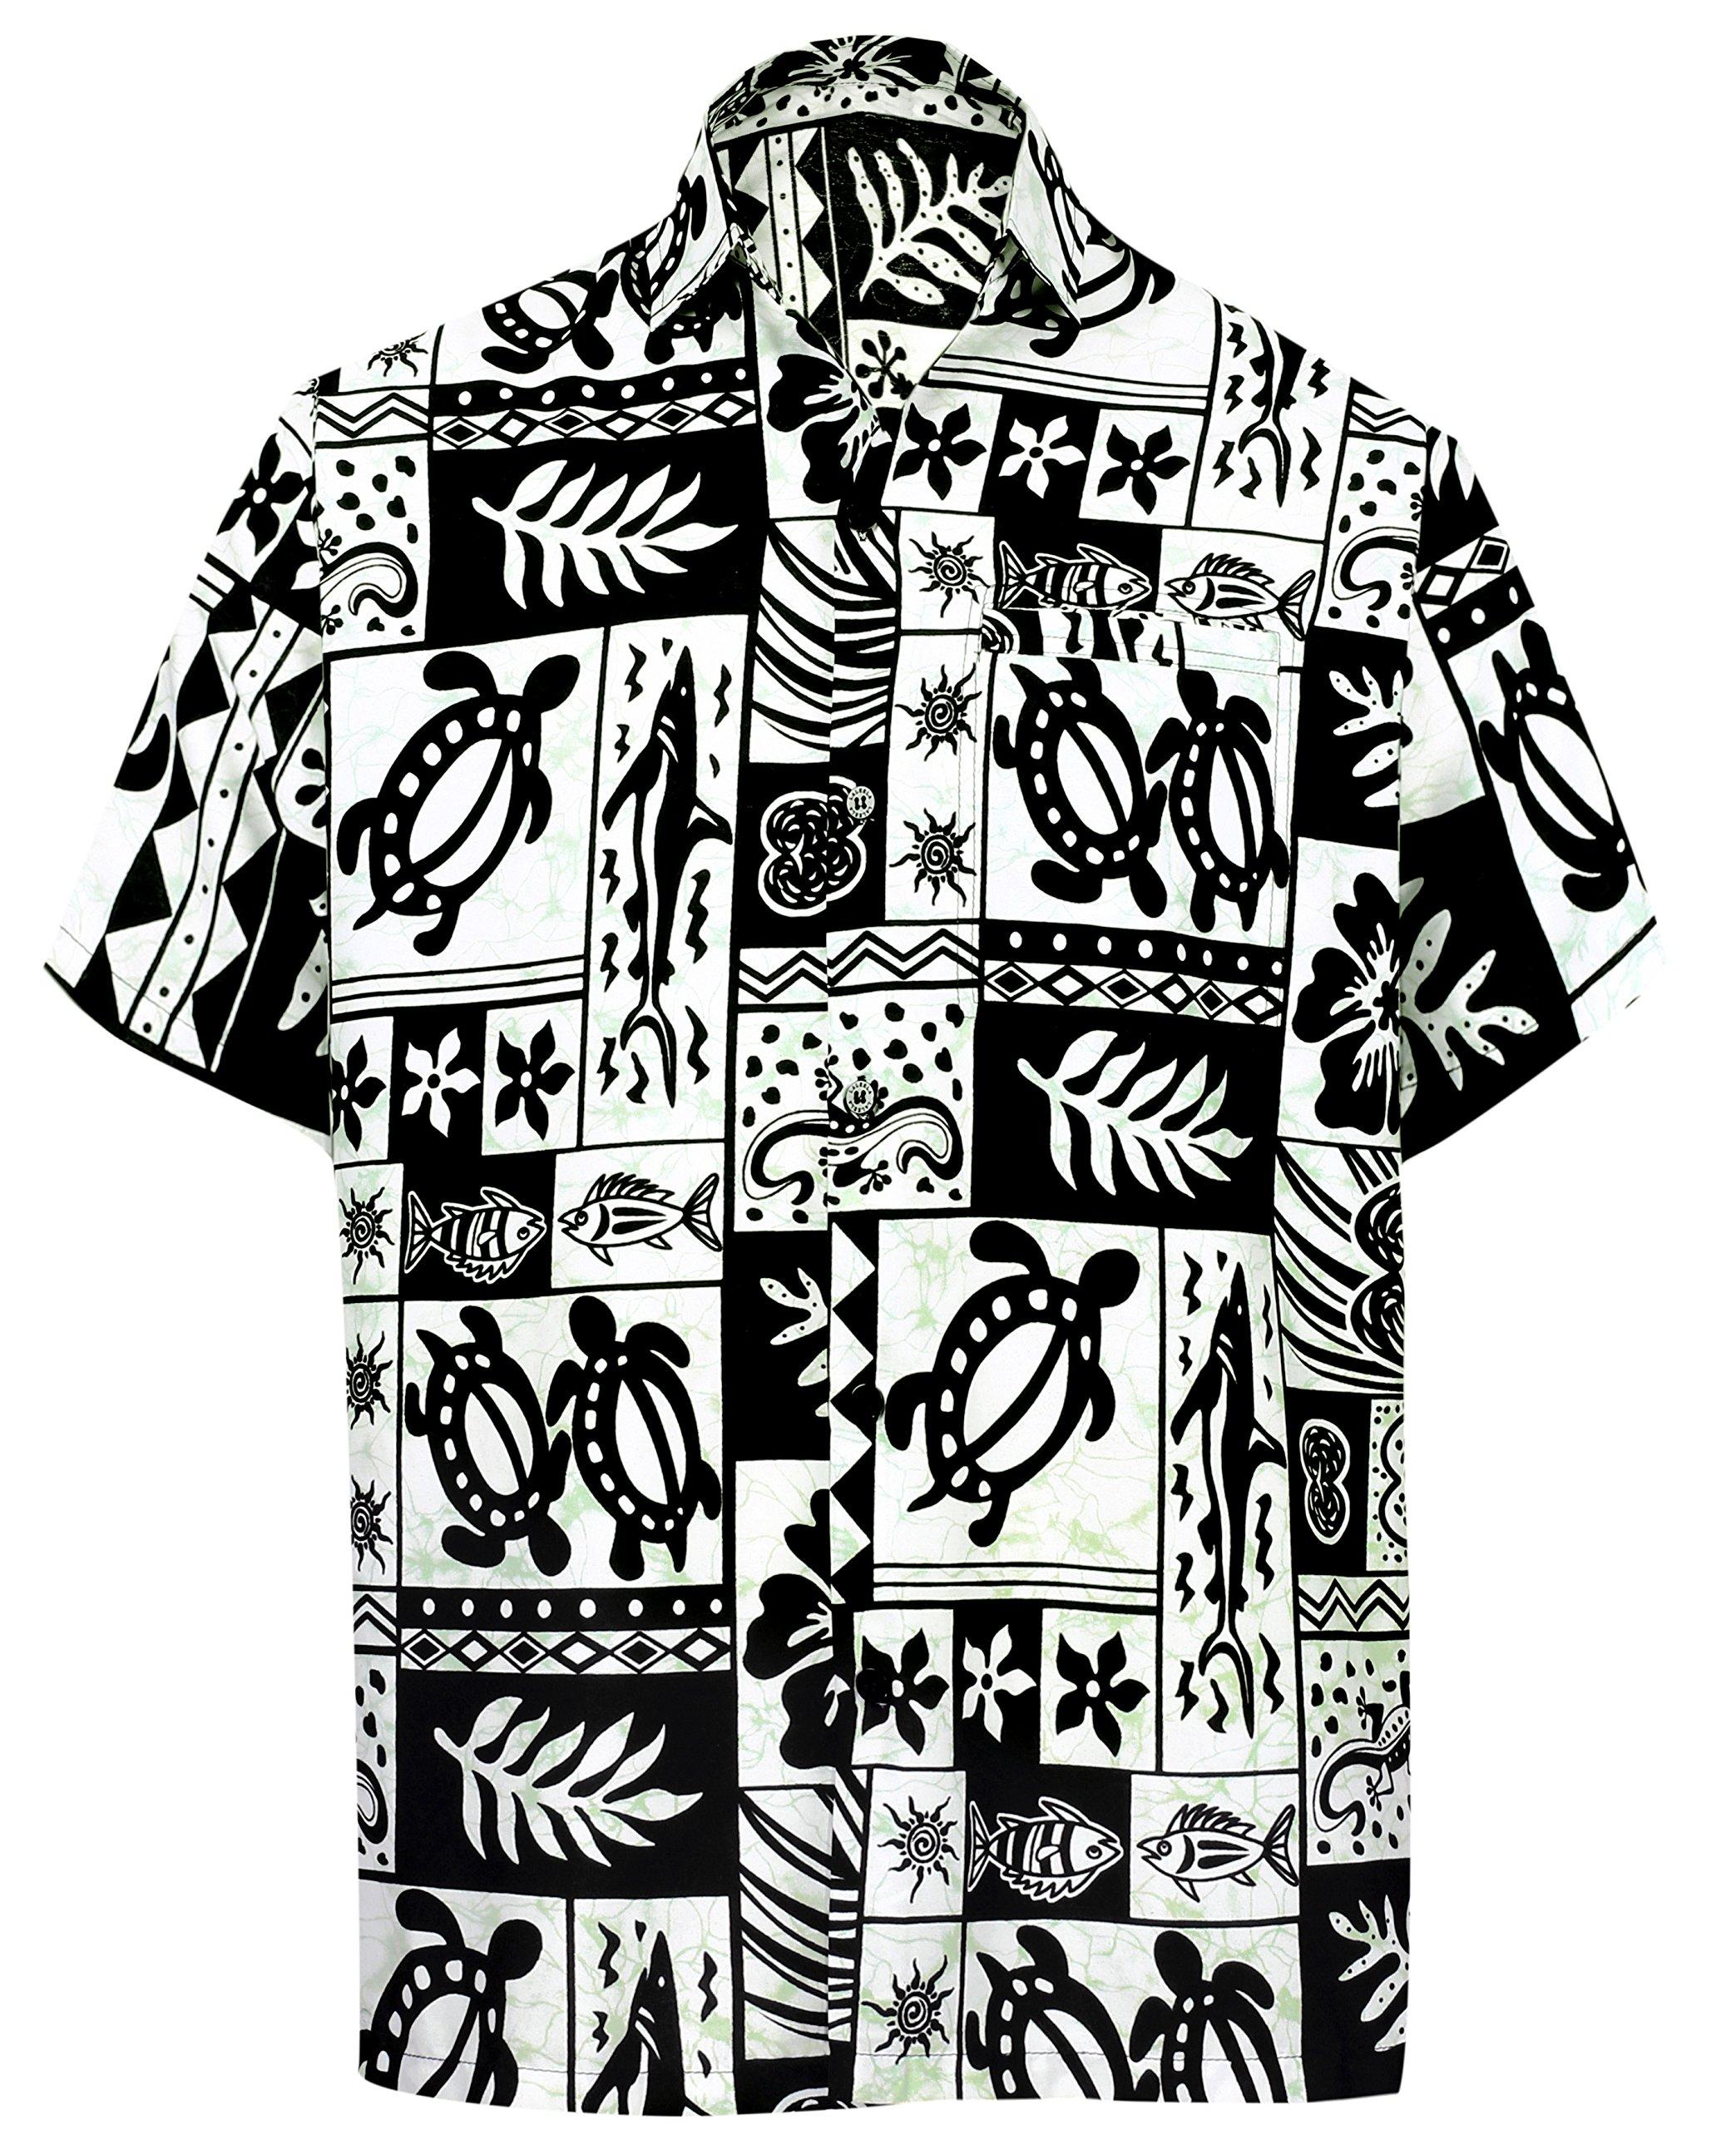 LA LEELA Likre Vacation Party Shirt Black 176 XL   Chest 48'' - 52''